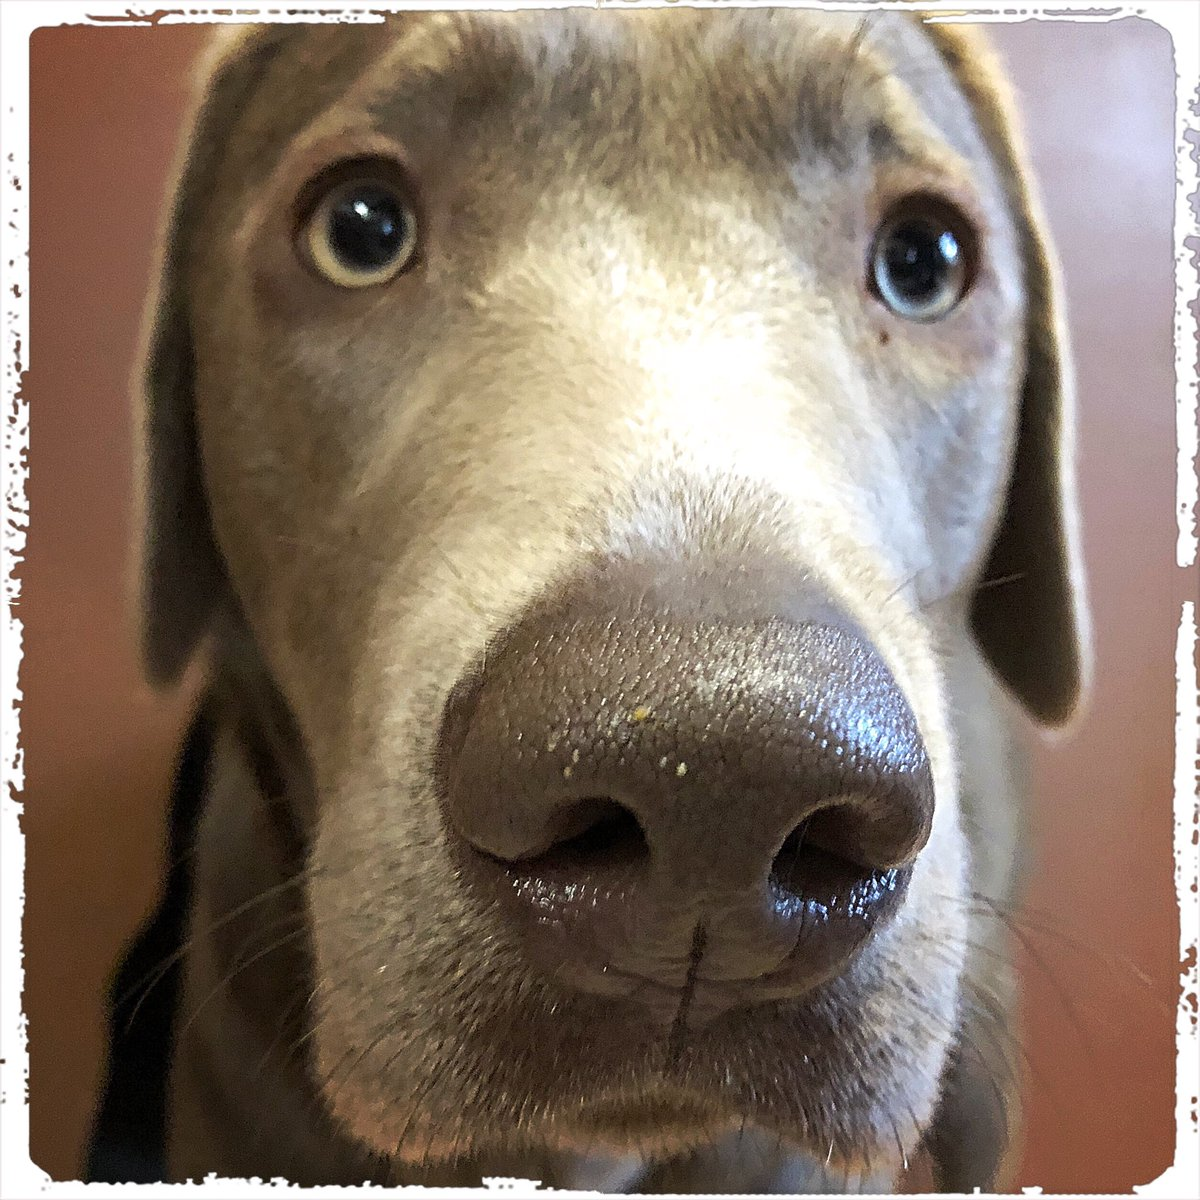 It's Fiona on #happyfriday  .  #doglover #ilovemydog #instadog  #meinhund #dogs_of_world #dogsearth #puppies #hund #hundeliebe #hundeleben #dog #dogislove #trustrespectlove #hundeland #hundeblog #lieblingshund #lebenmithund  #besterhund #dogsneeddogs #doggy #dogs #besterhundpic.twitter.com/KSEvYhj2Dk